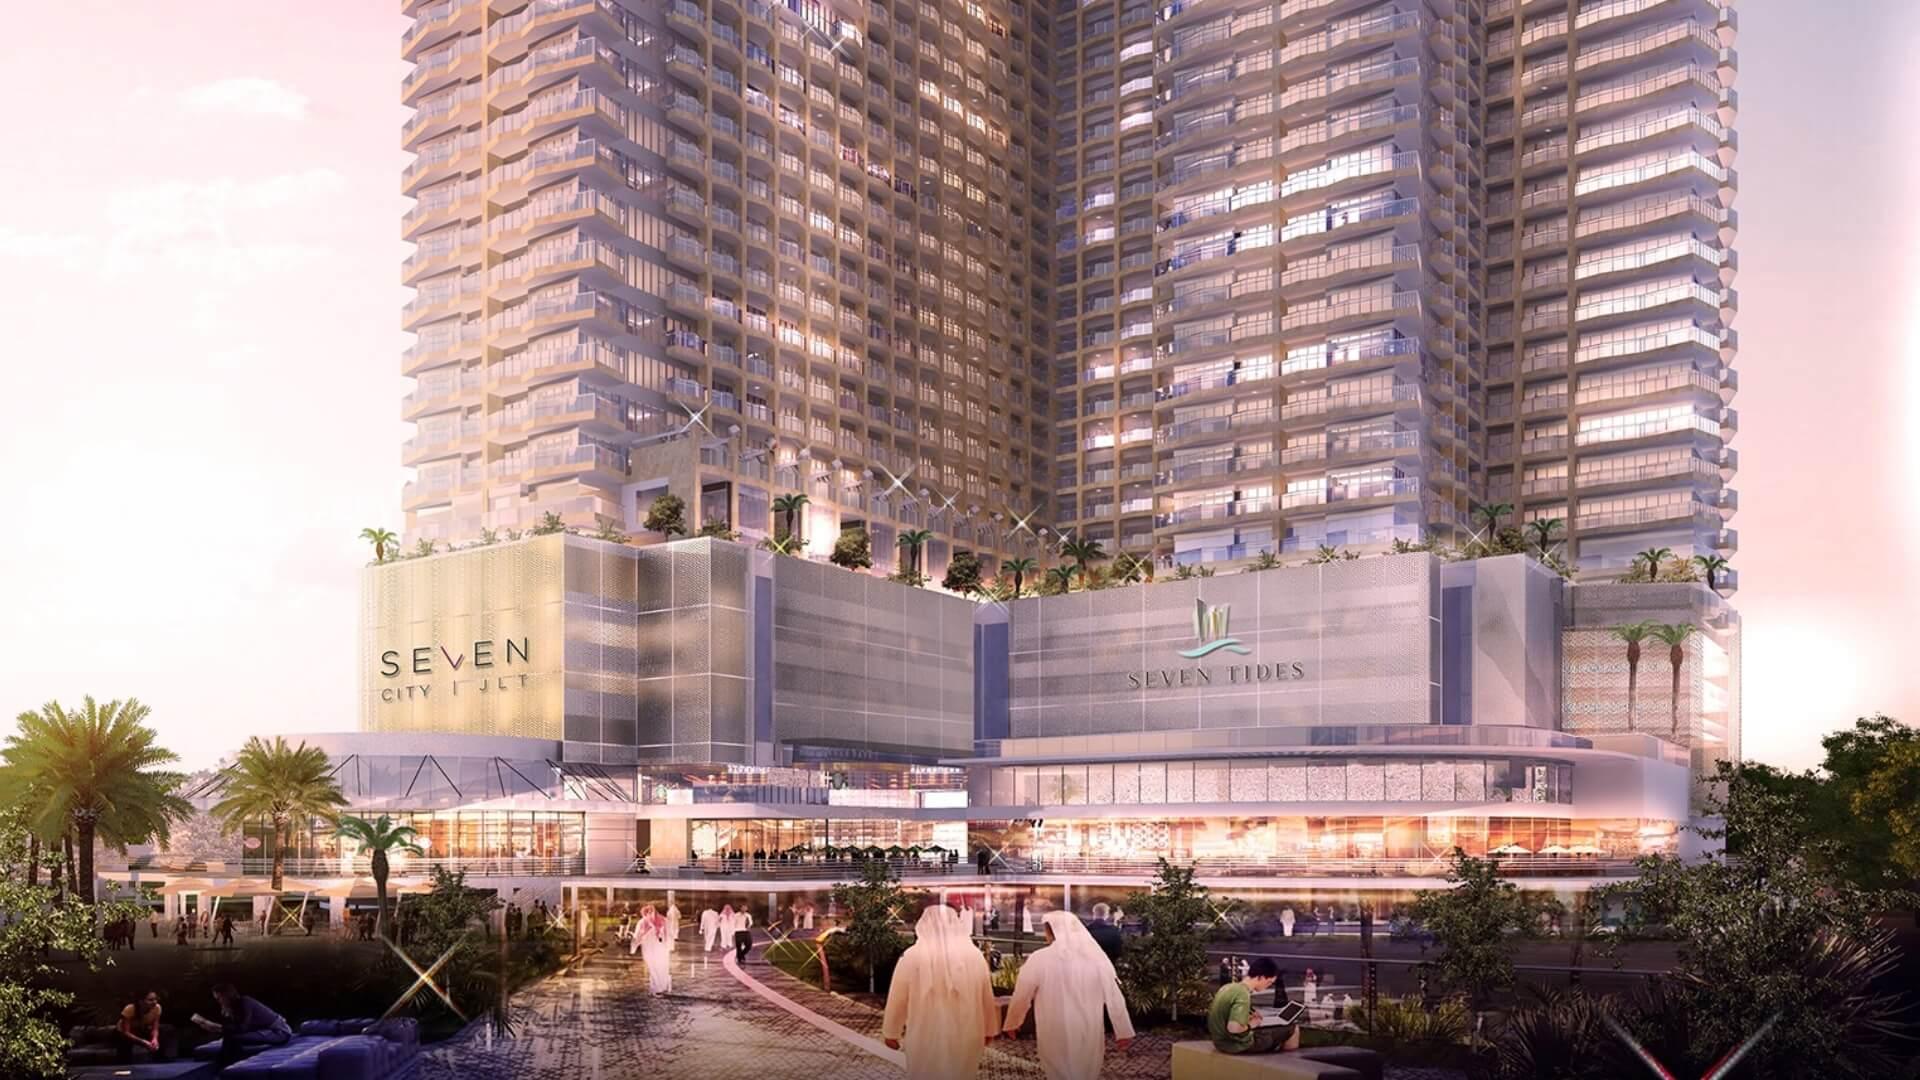 GOLF VIEWS SEVEN CITY, Jumeirah Lake Towers, Dubai, UAE – photo 8